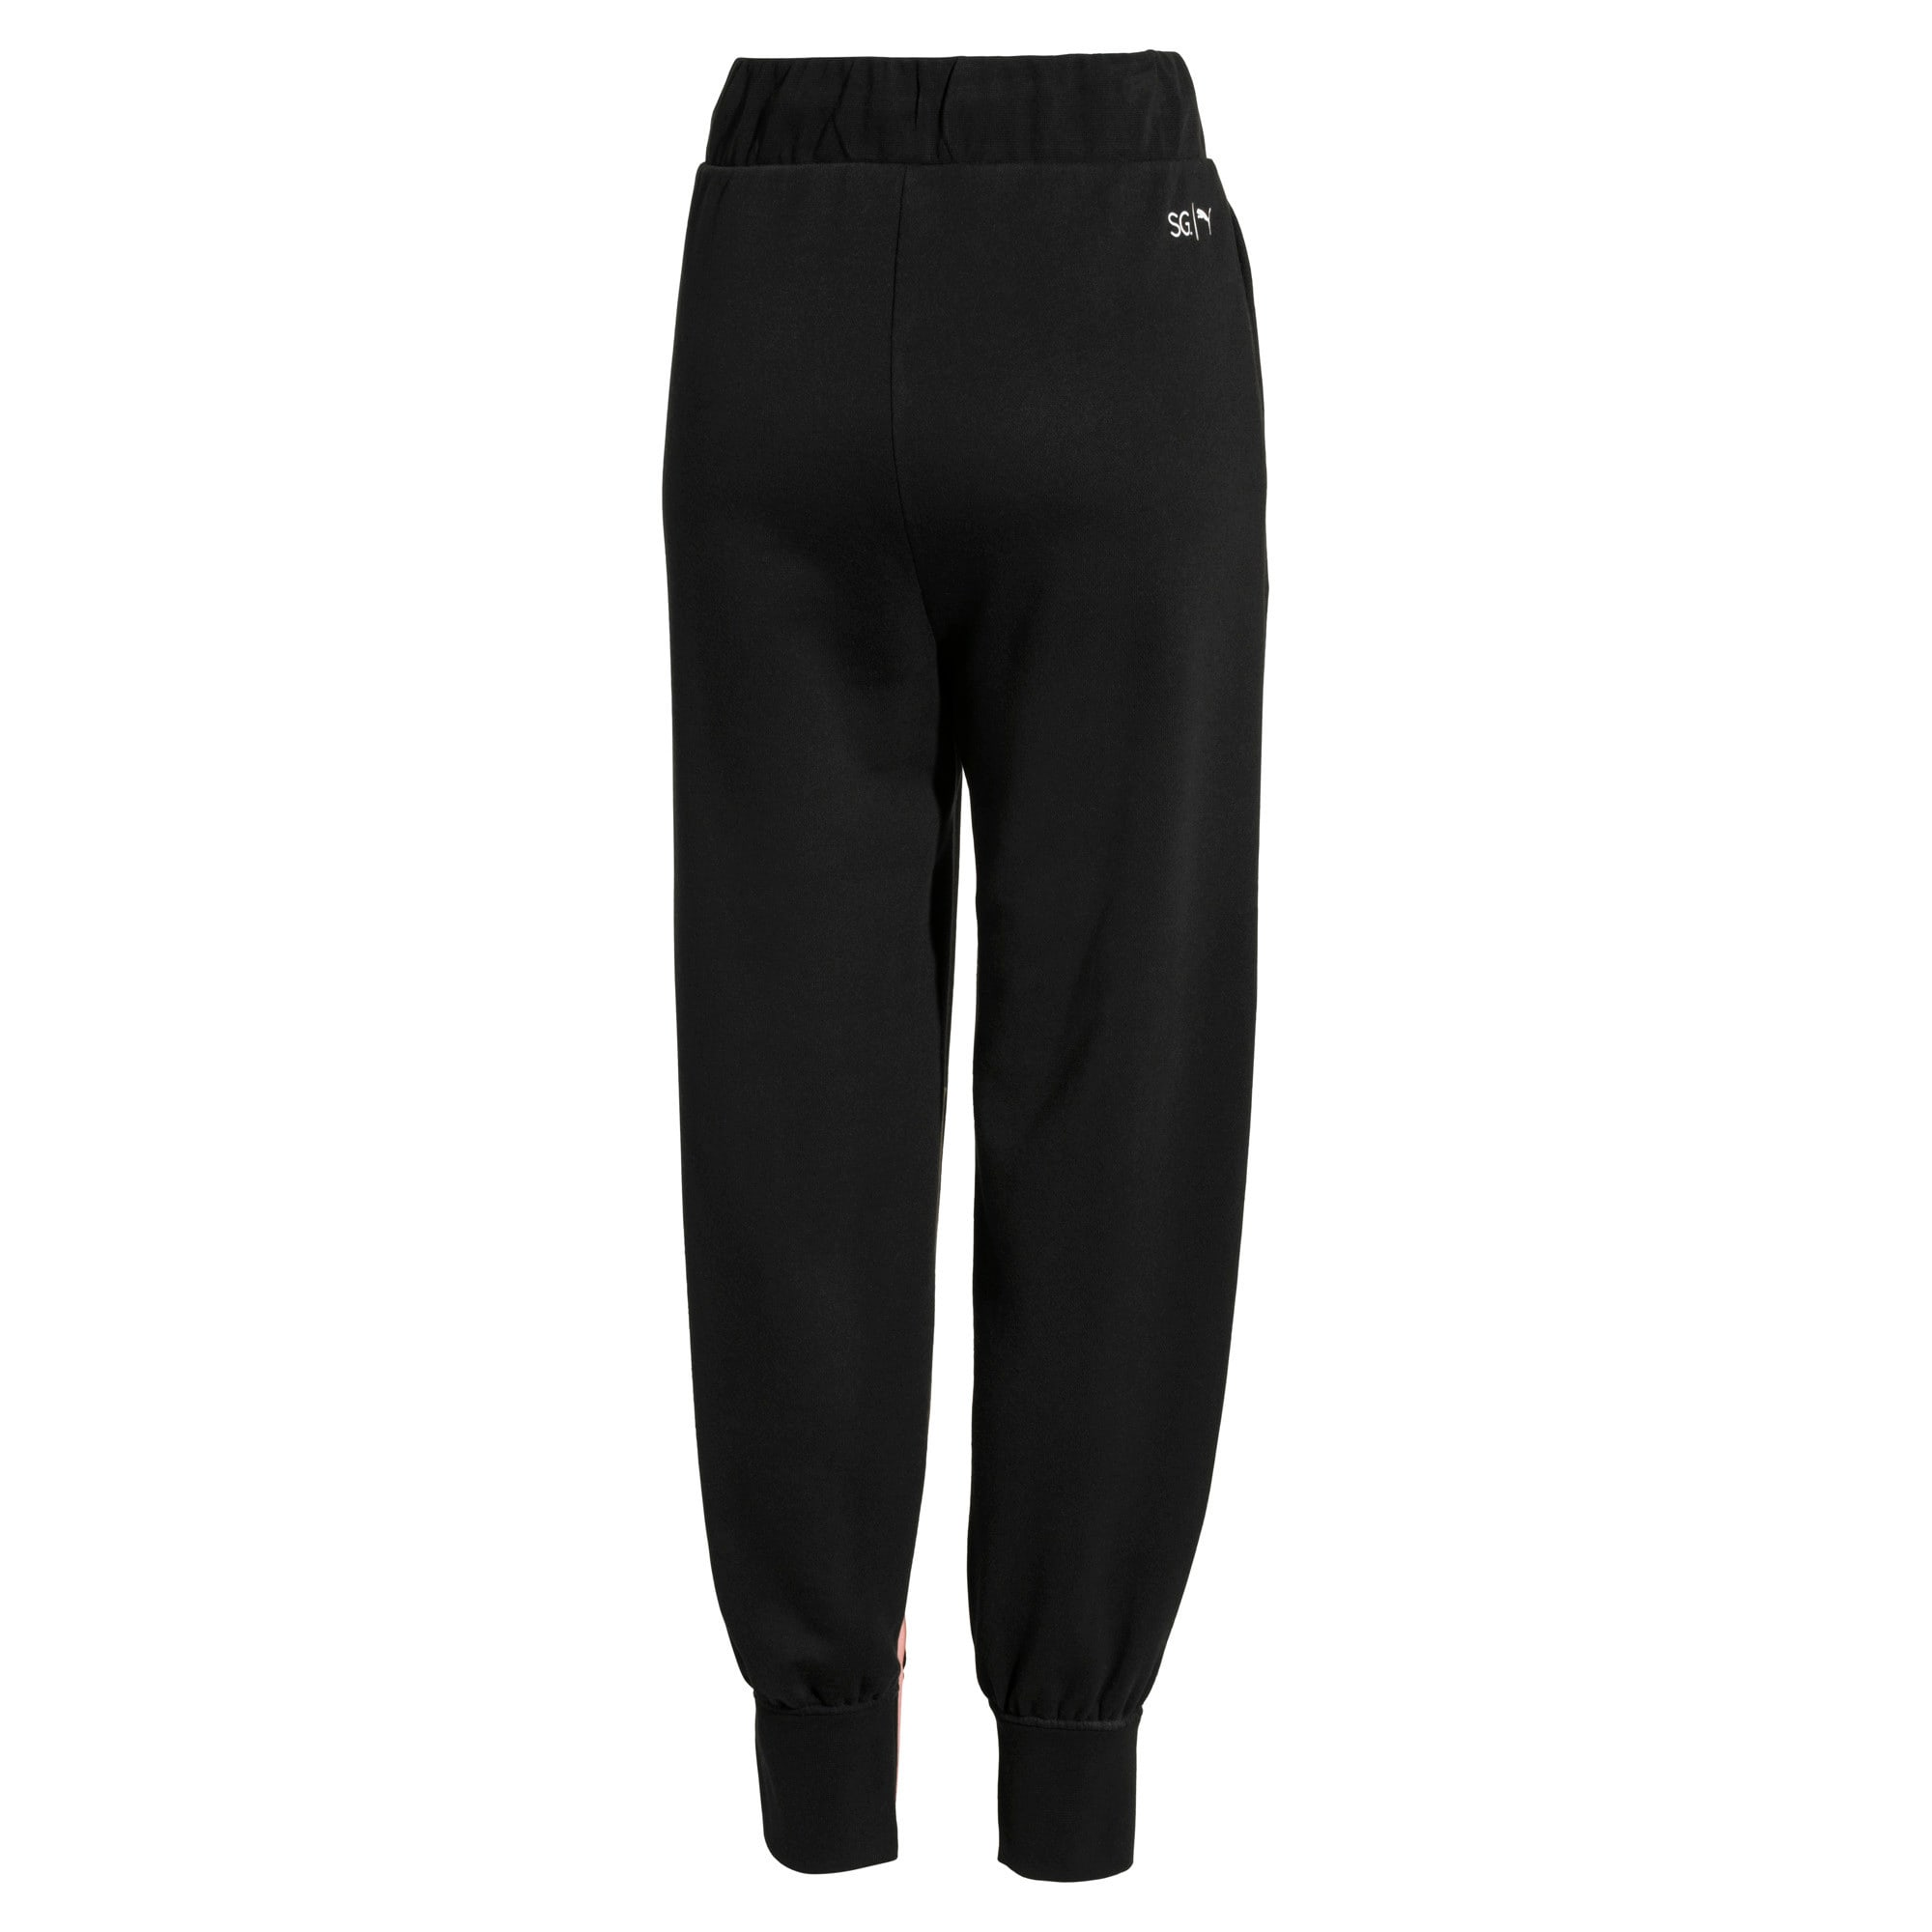 Thumbnail 5 of PUMA x SELENA GOMEZ Women's Sweatpants, Puma Black, medium